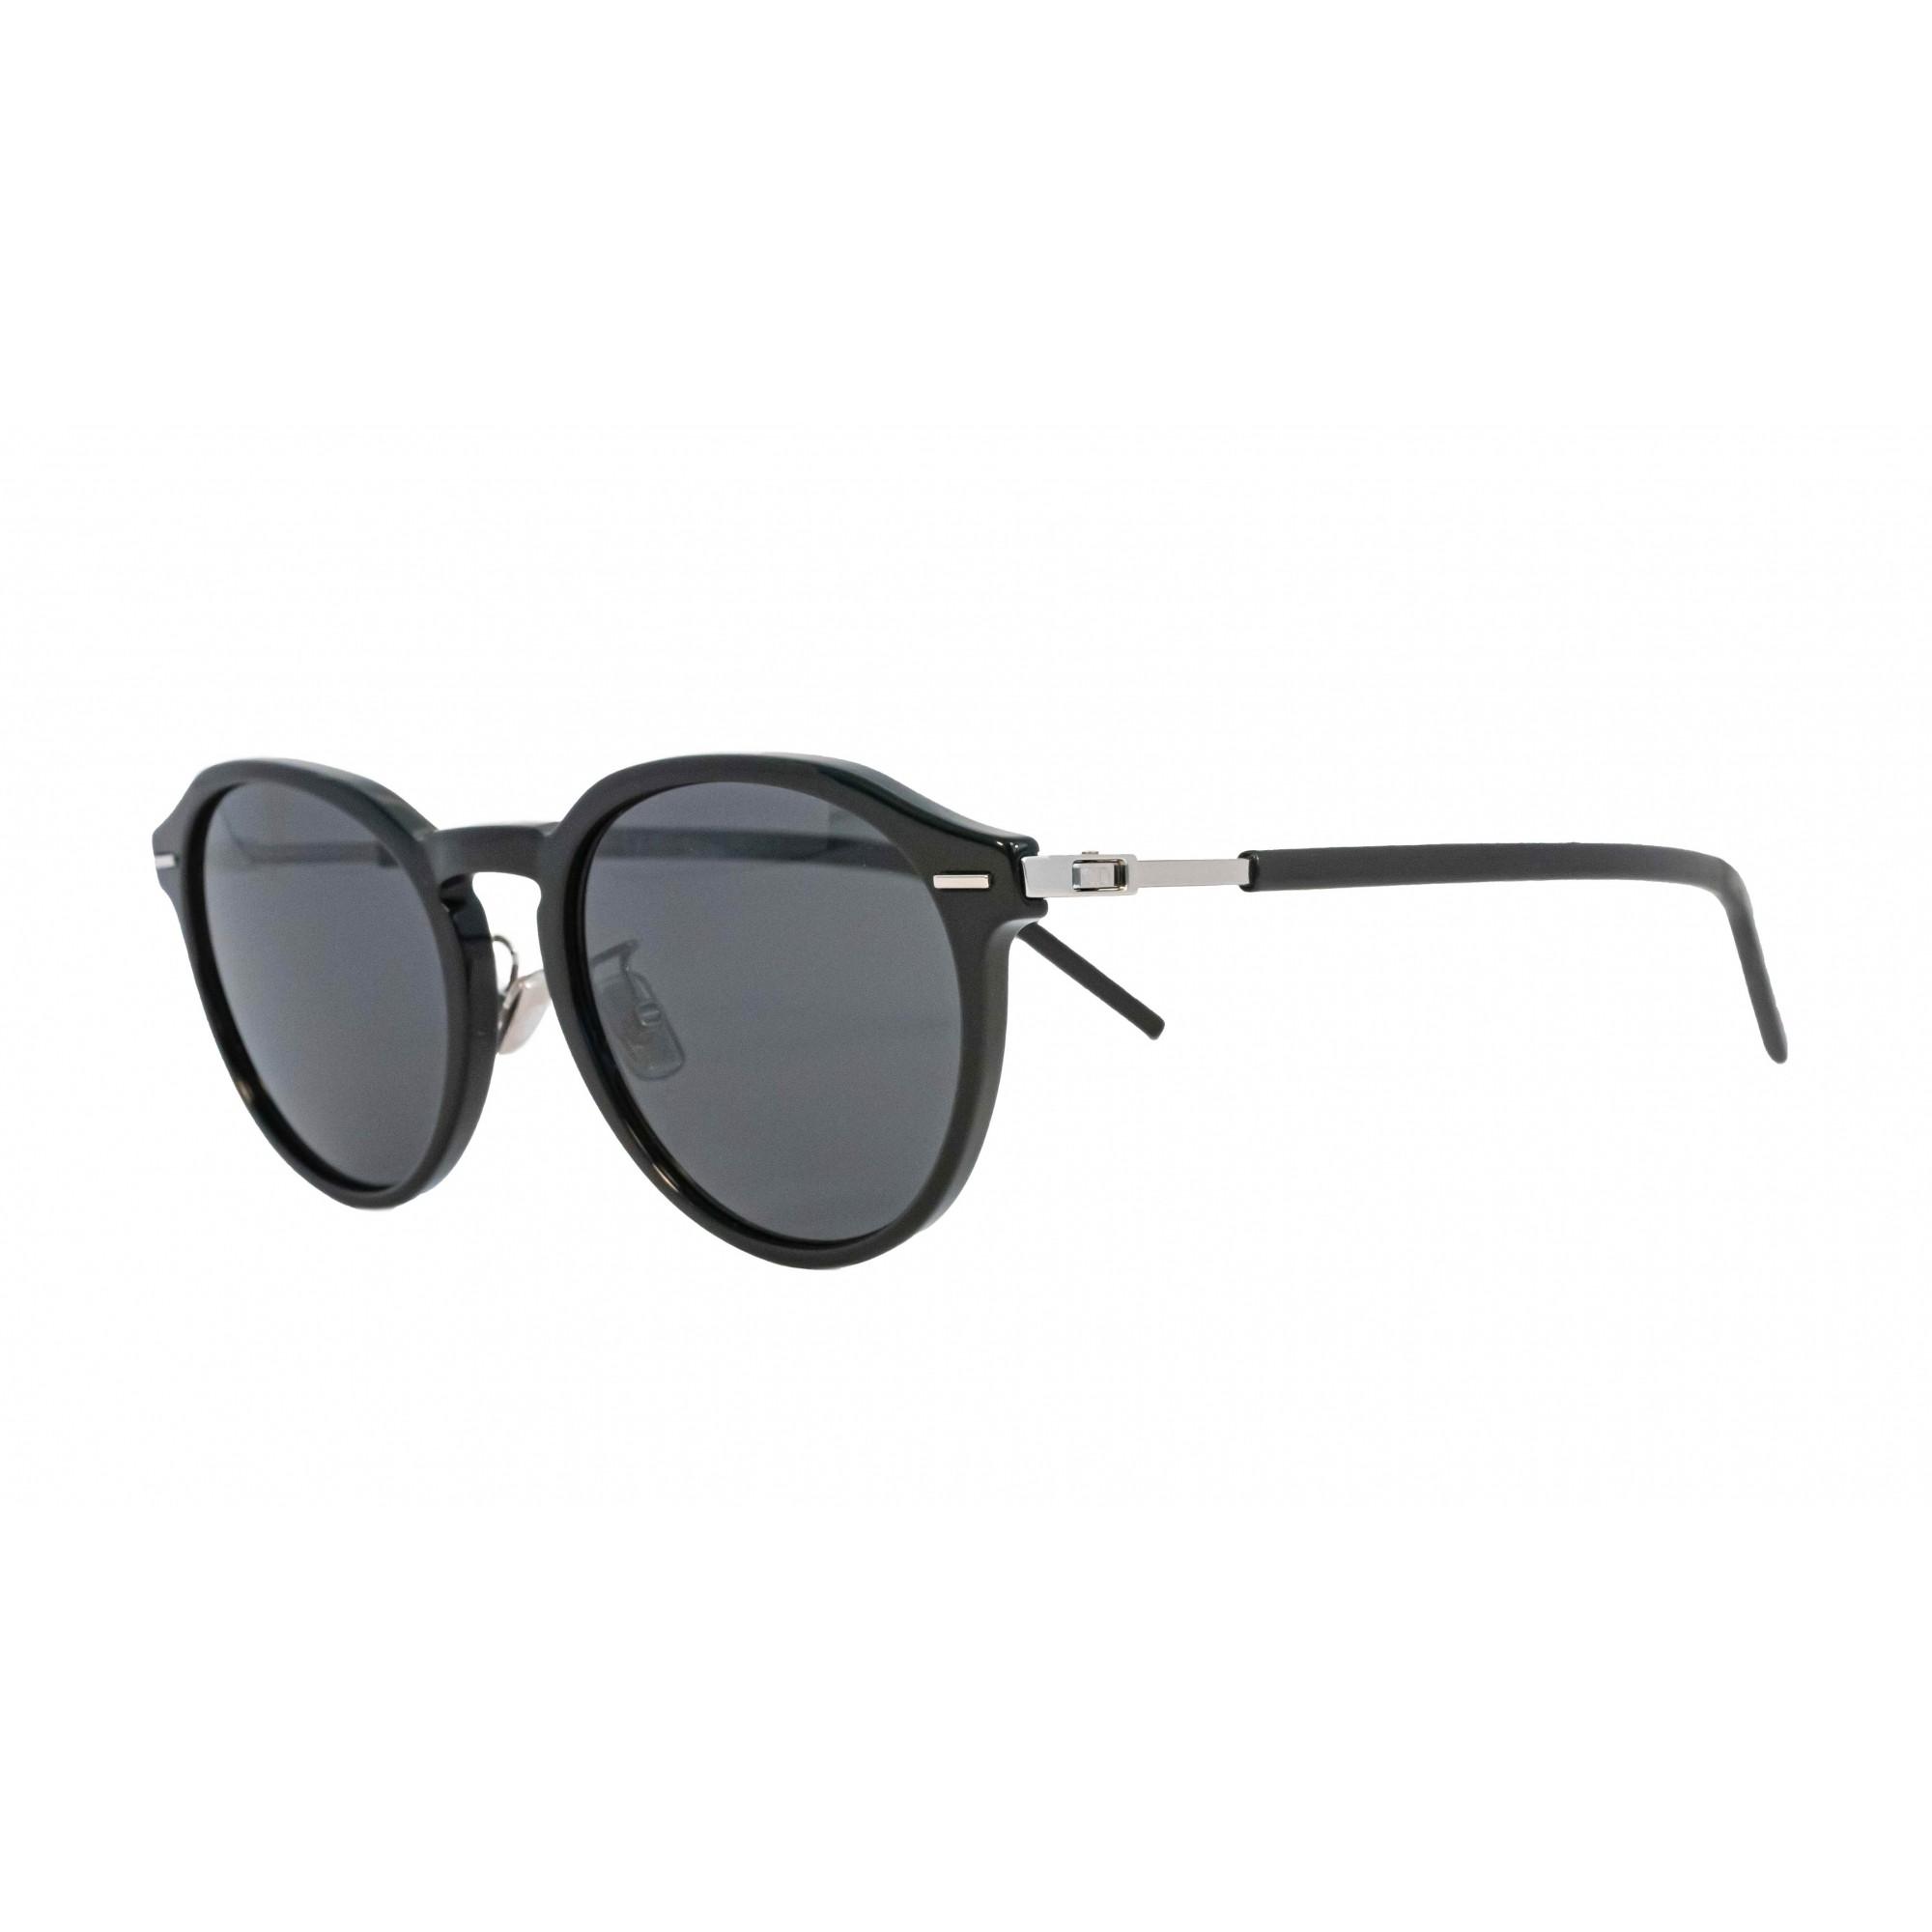 Óculos Dior Redondo Technicity7f 807ir 52 Preto